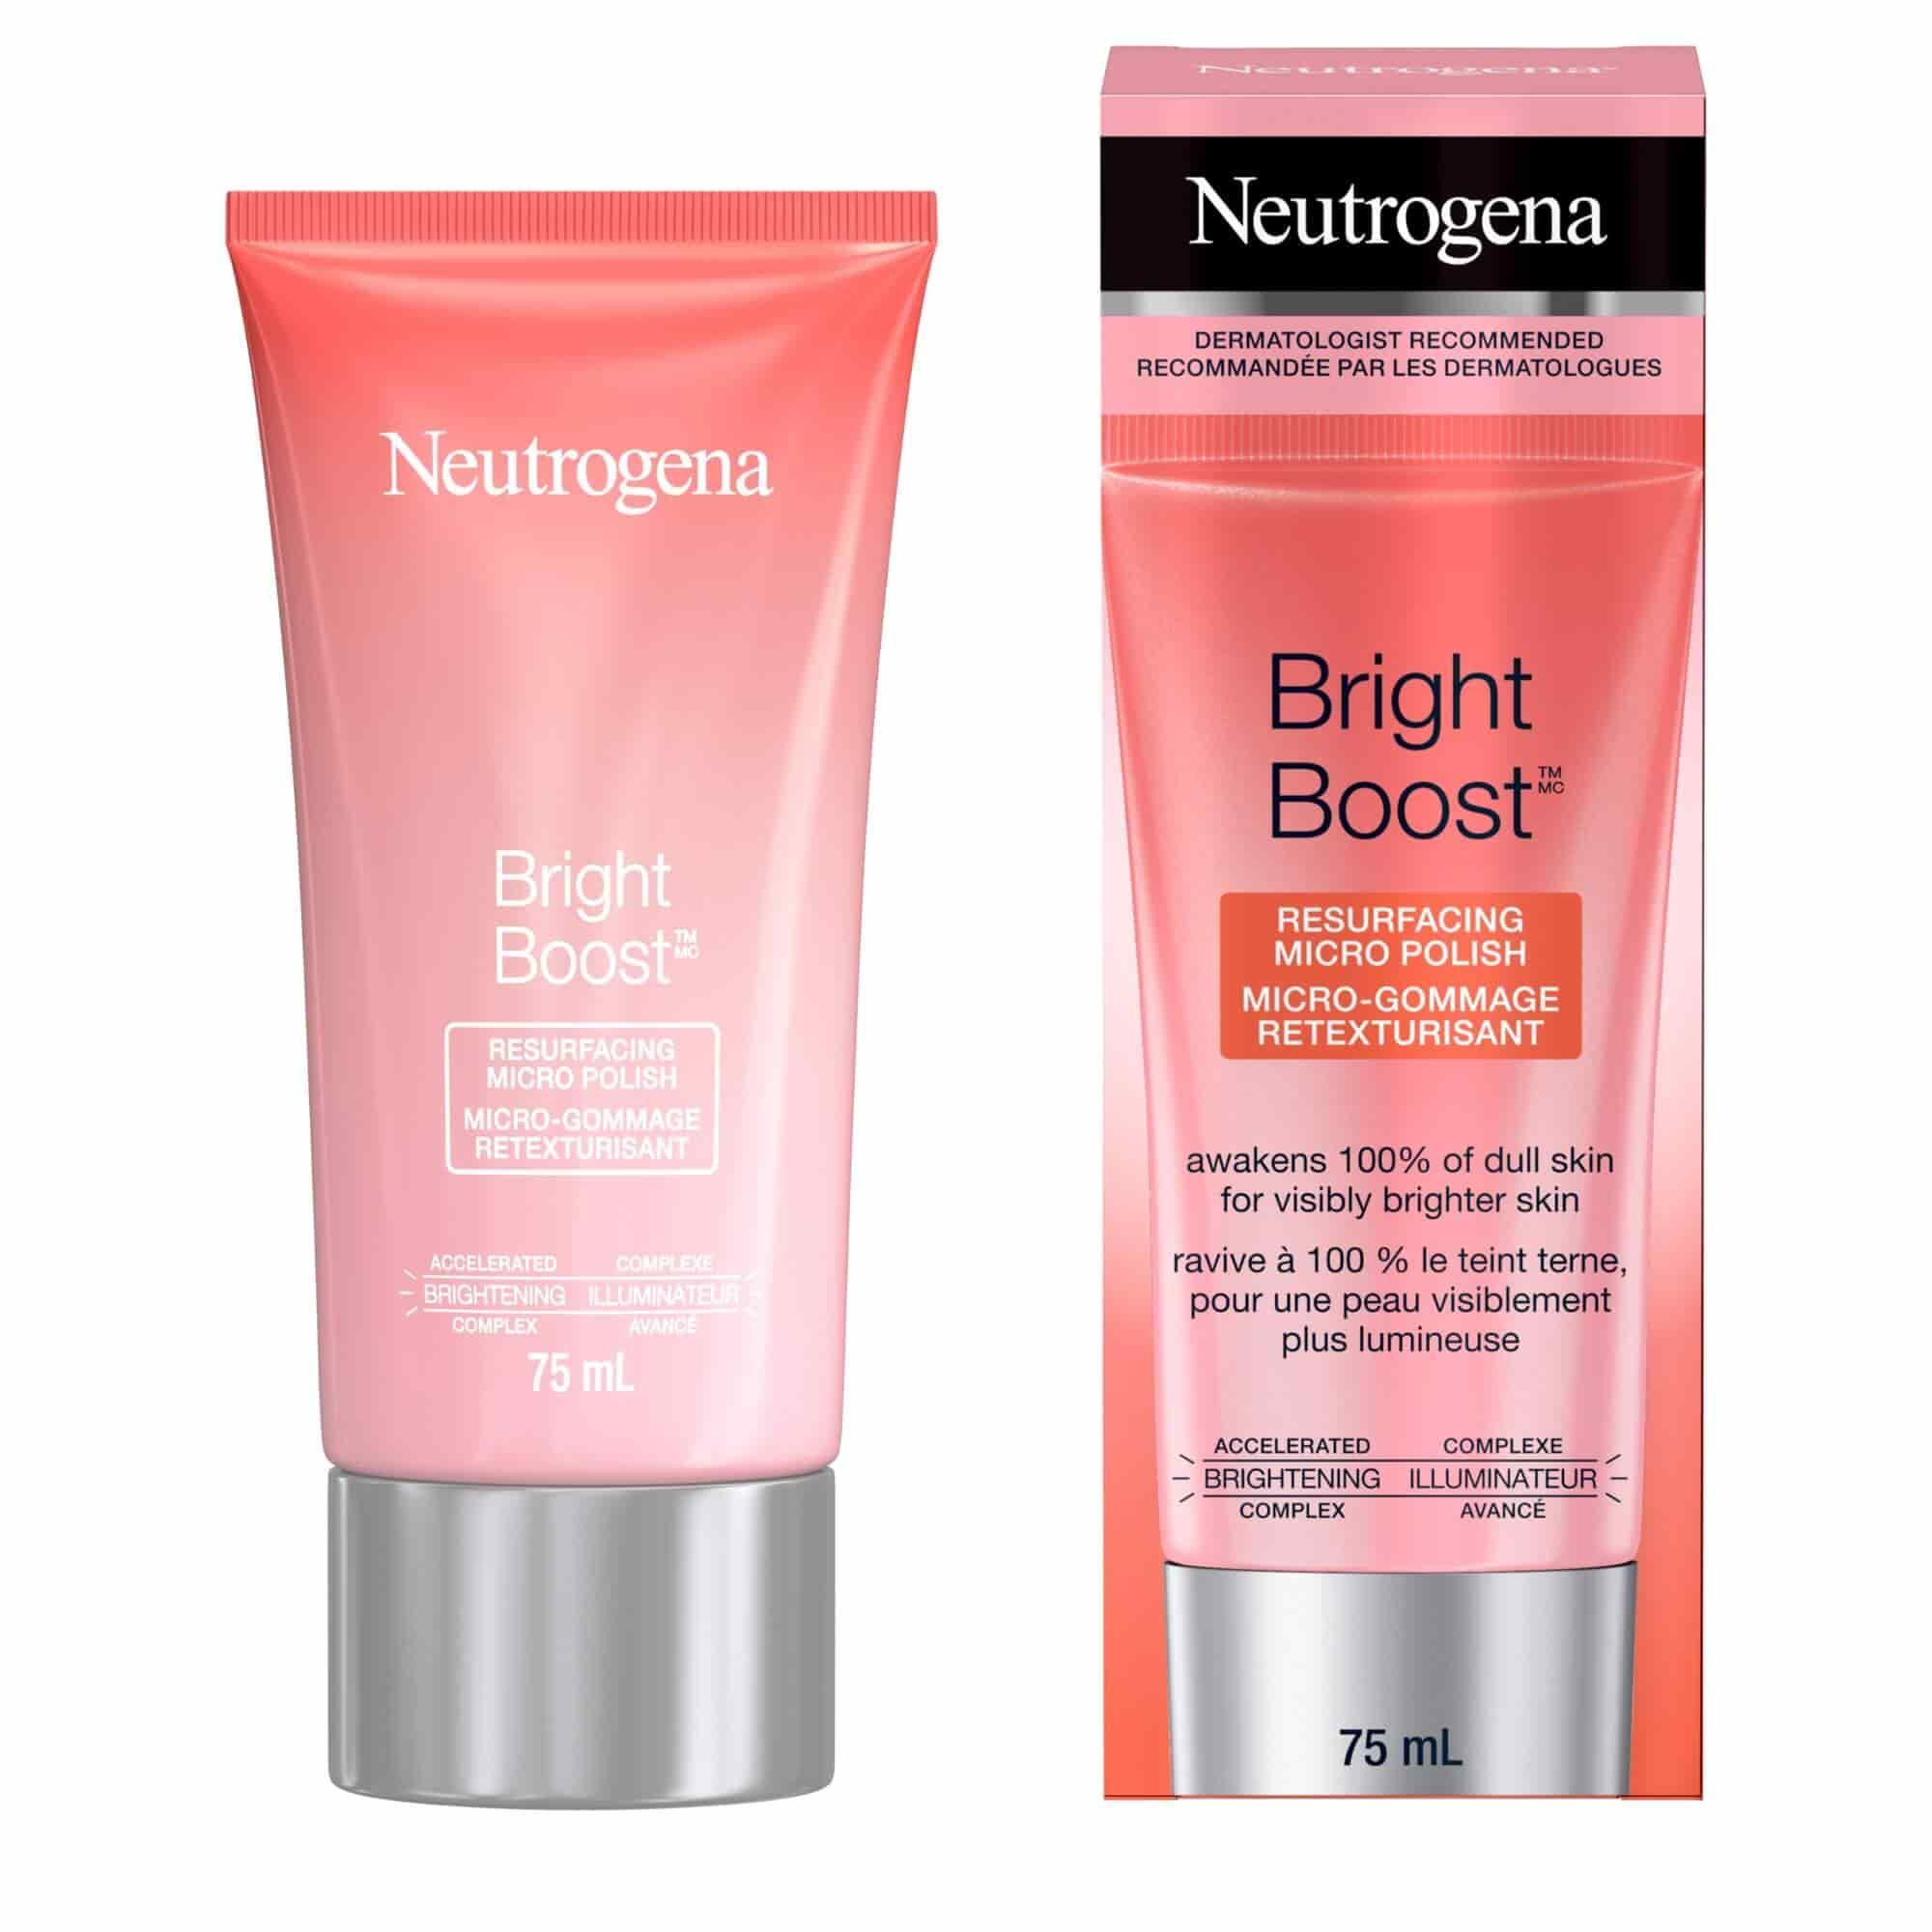 Neutrogena Bright Boost™ Resurfacing Micro Polish, 75 ml